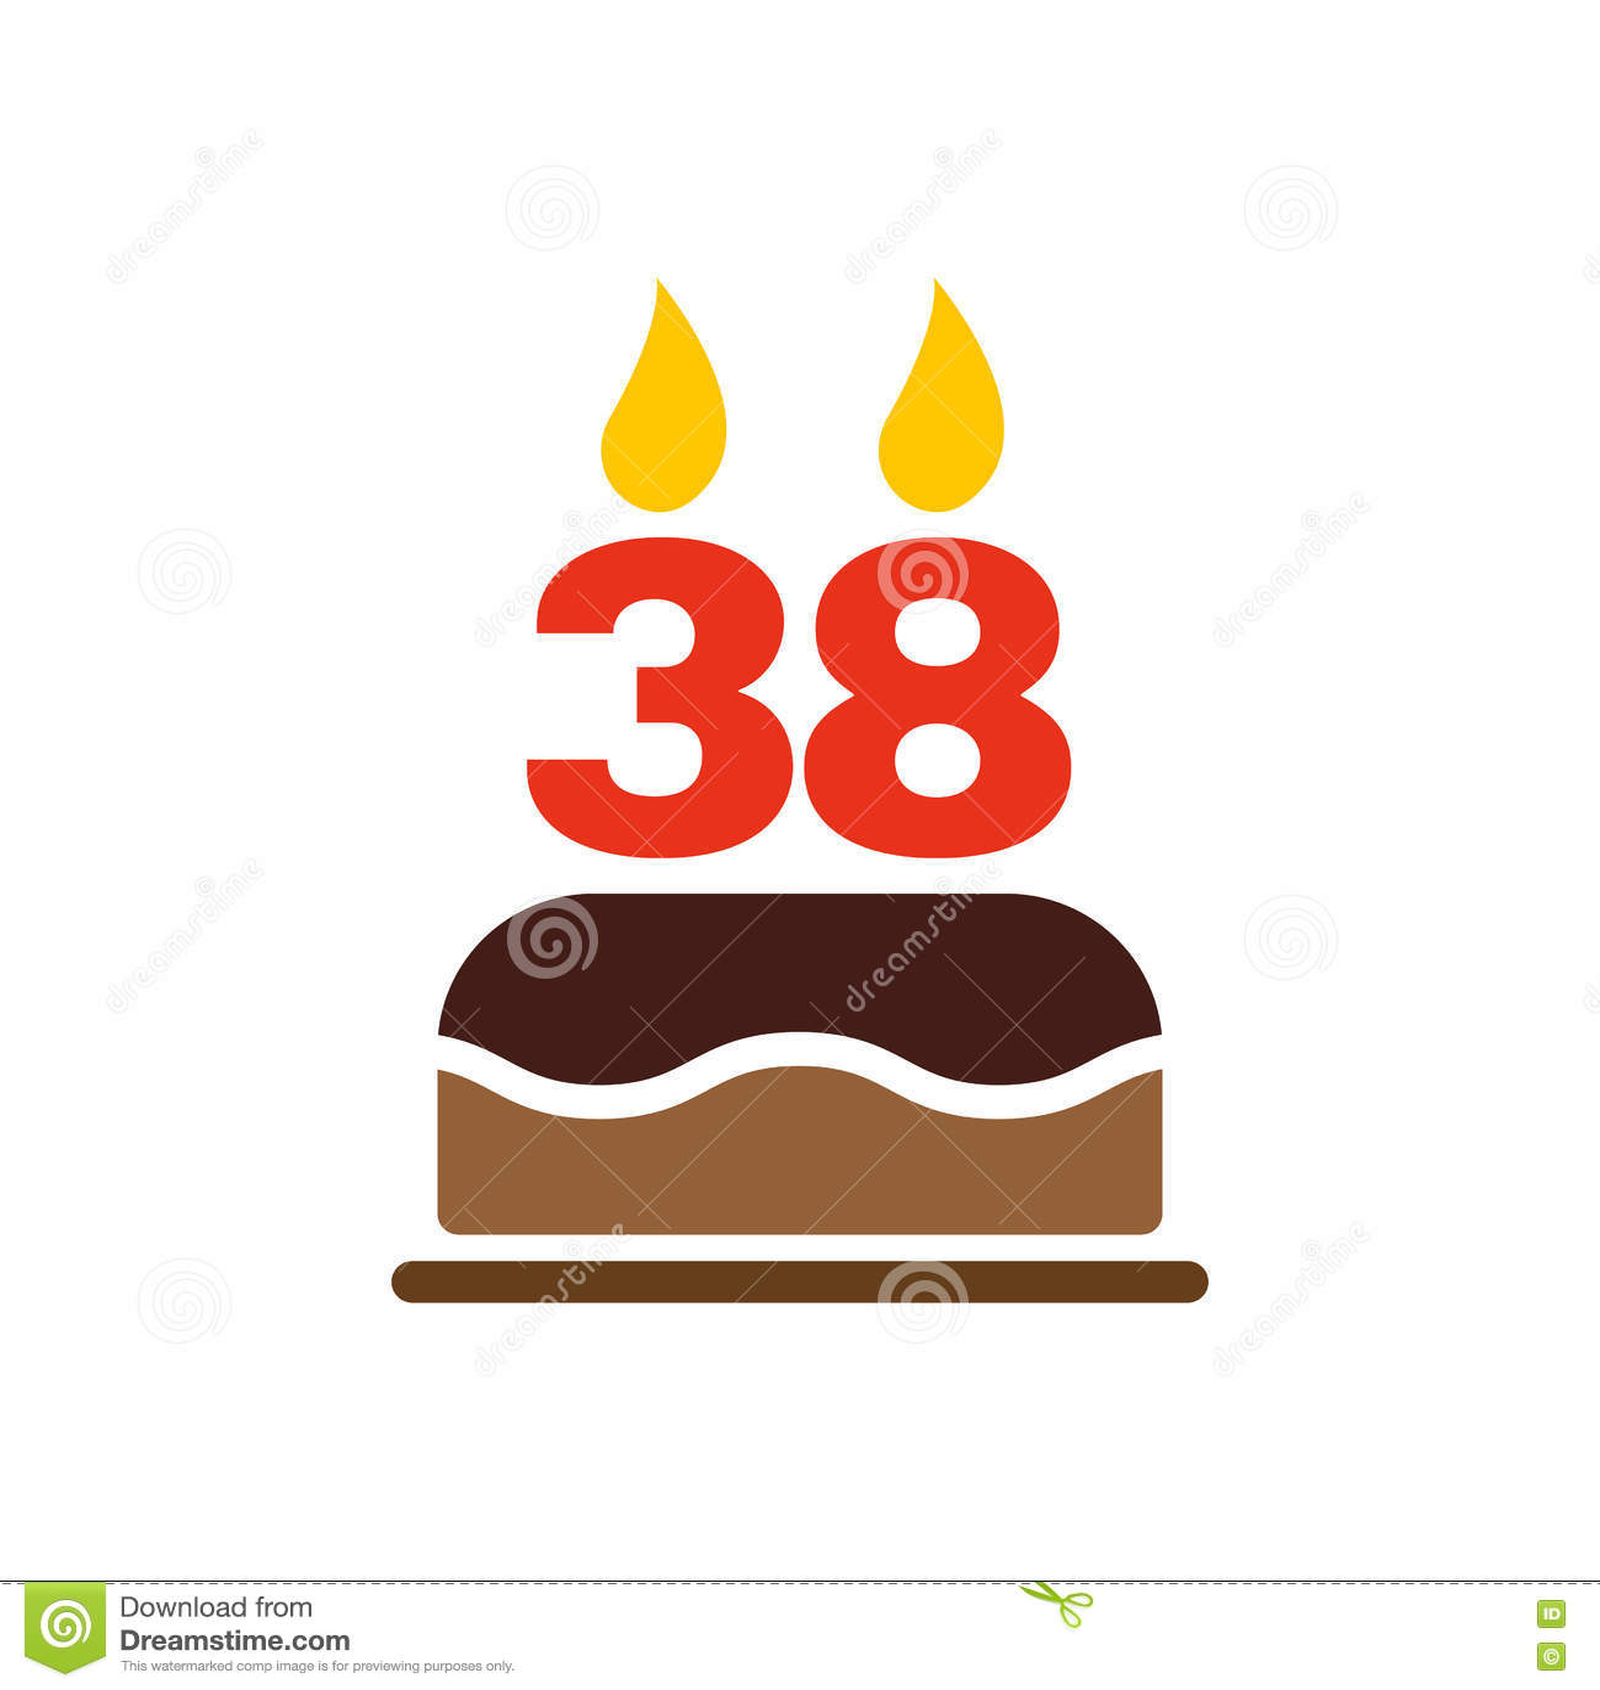 Birthday Cake Symbol Word Image Inspiration of Cake and Birthday